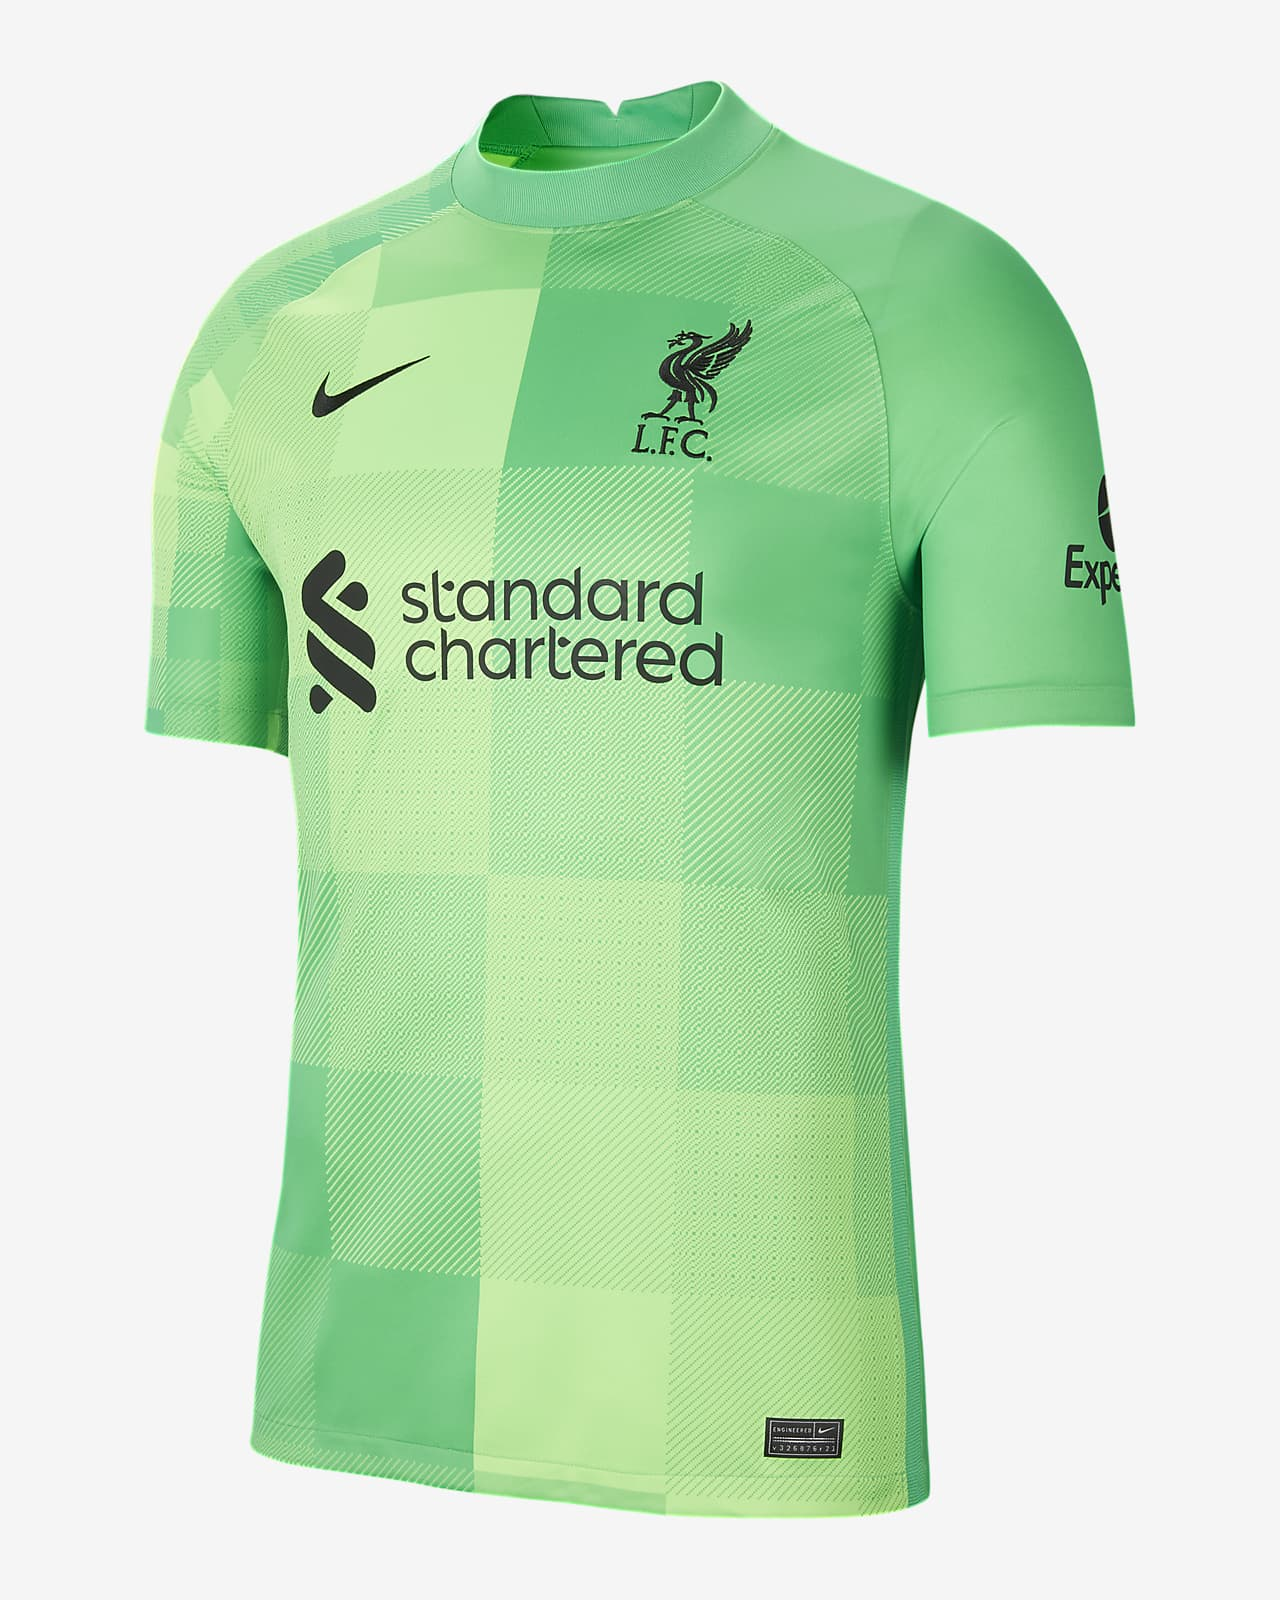 Liverpool F.C. 2021/22 Stadium Goalkeeper Men's Football Jersey